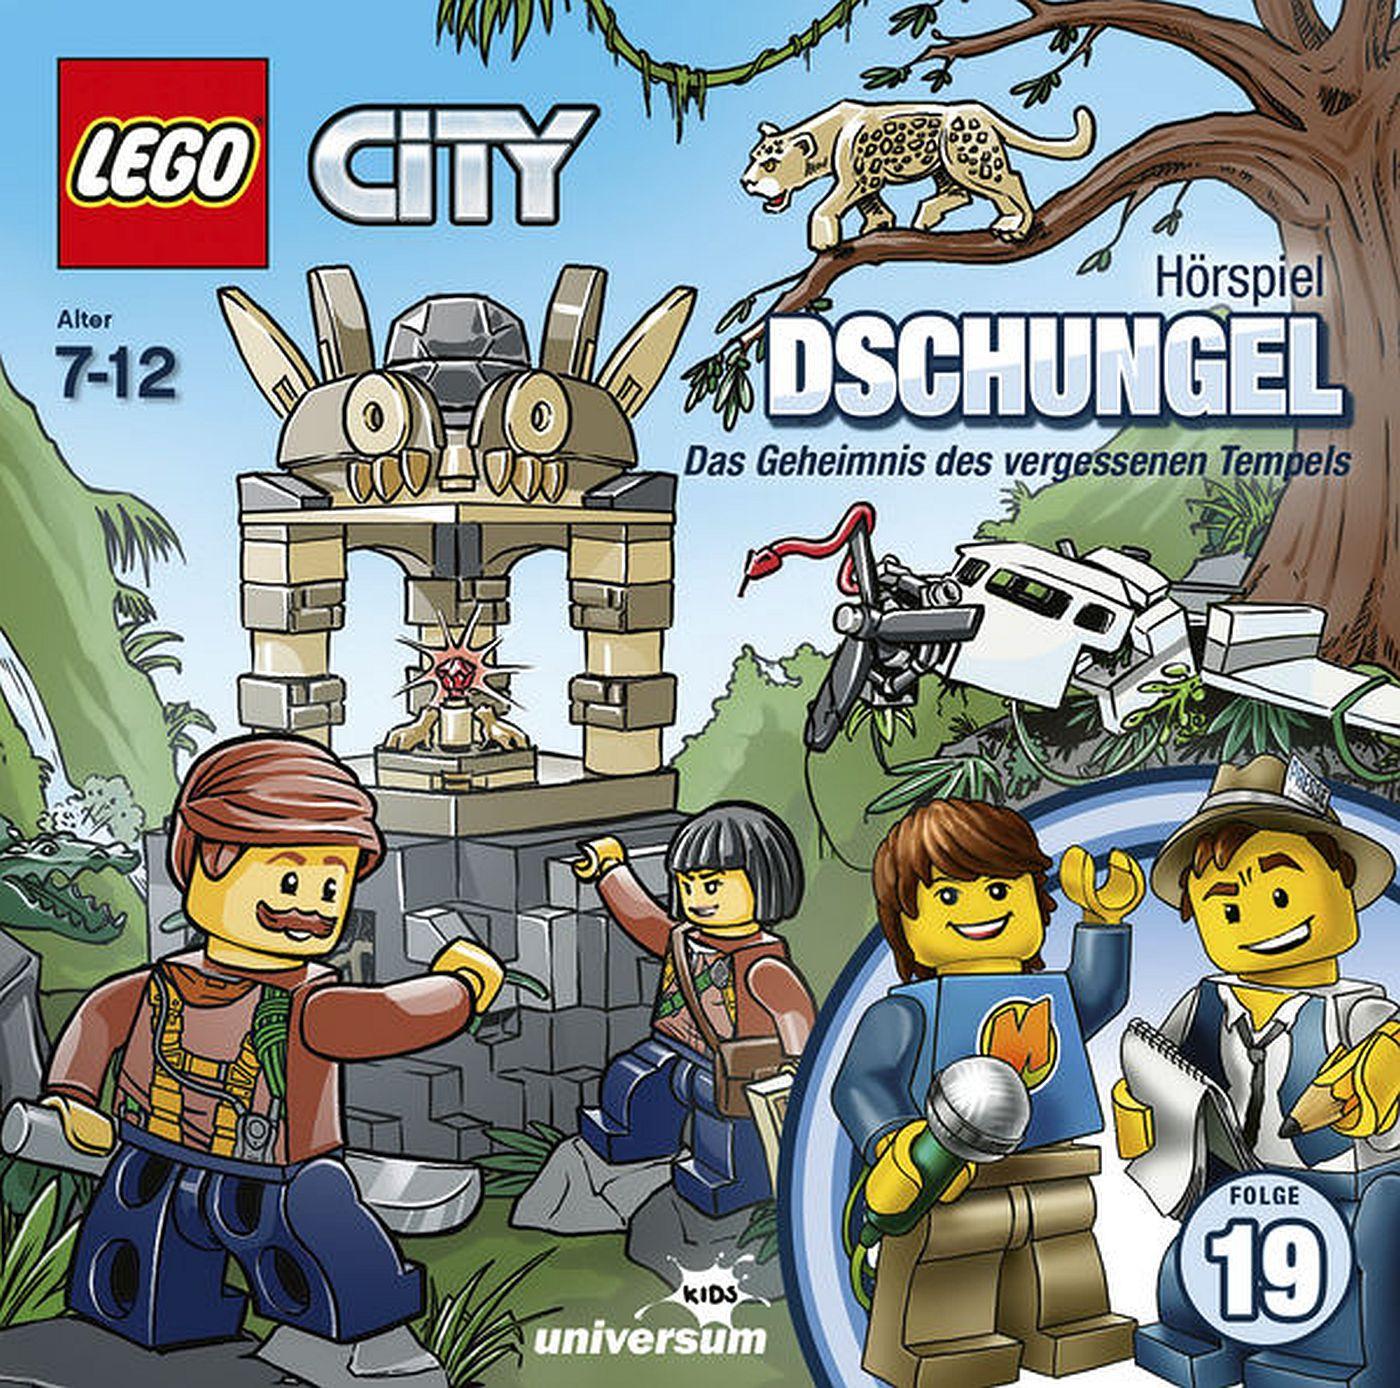 LEGO City - 19 - Dschungel